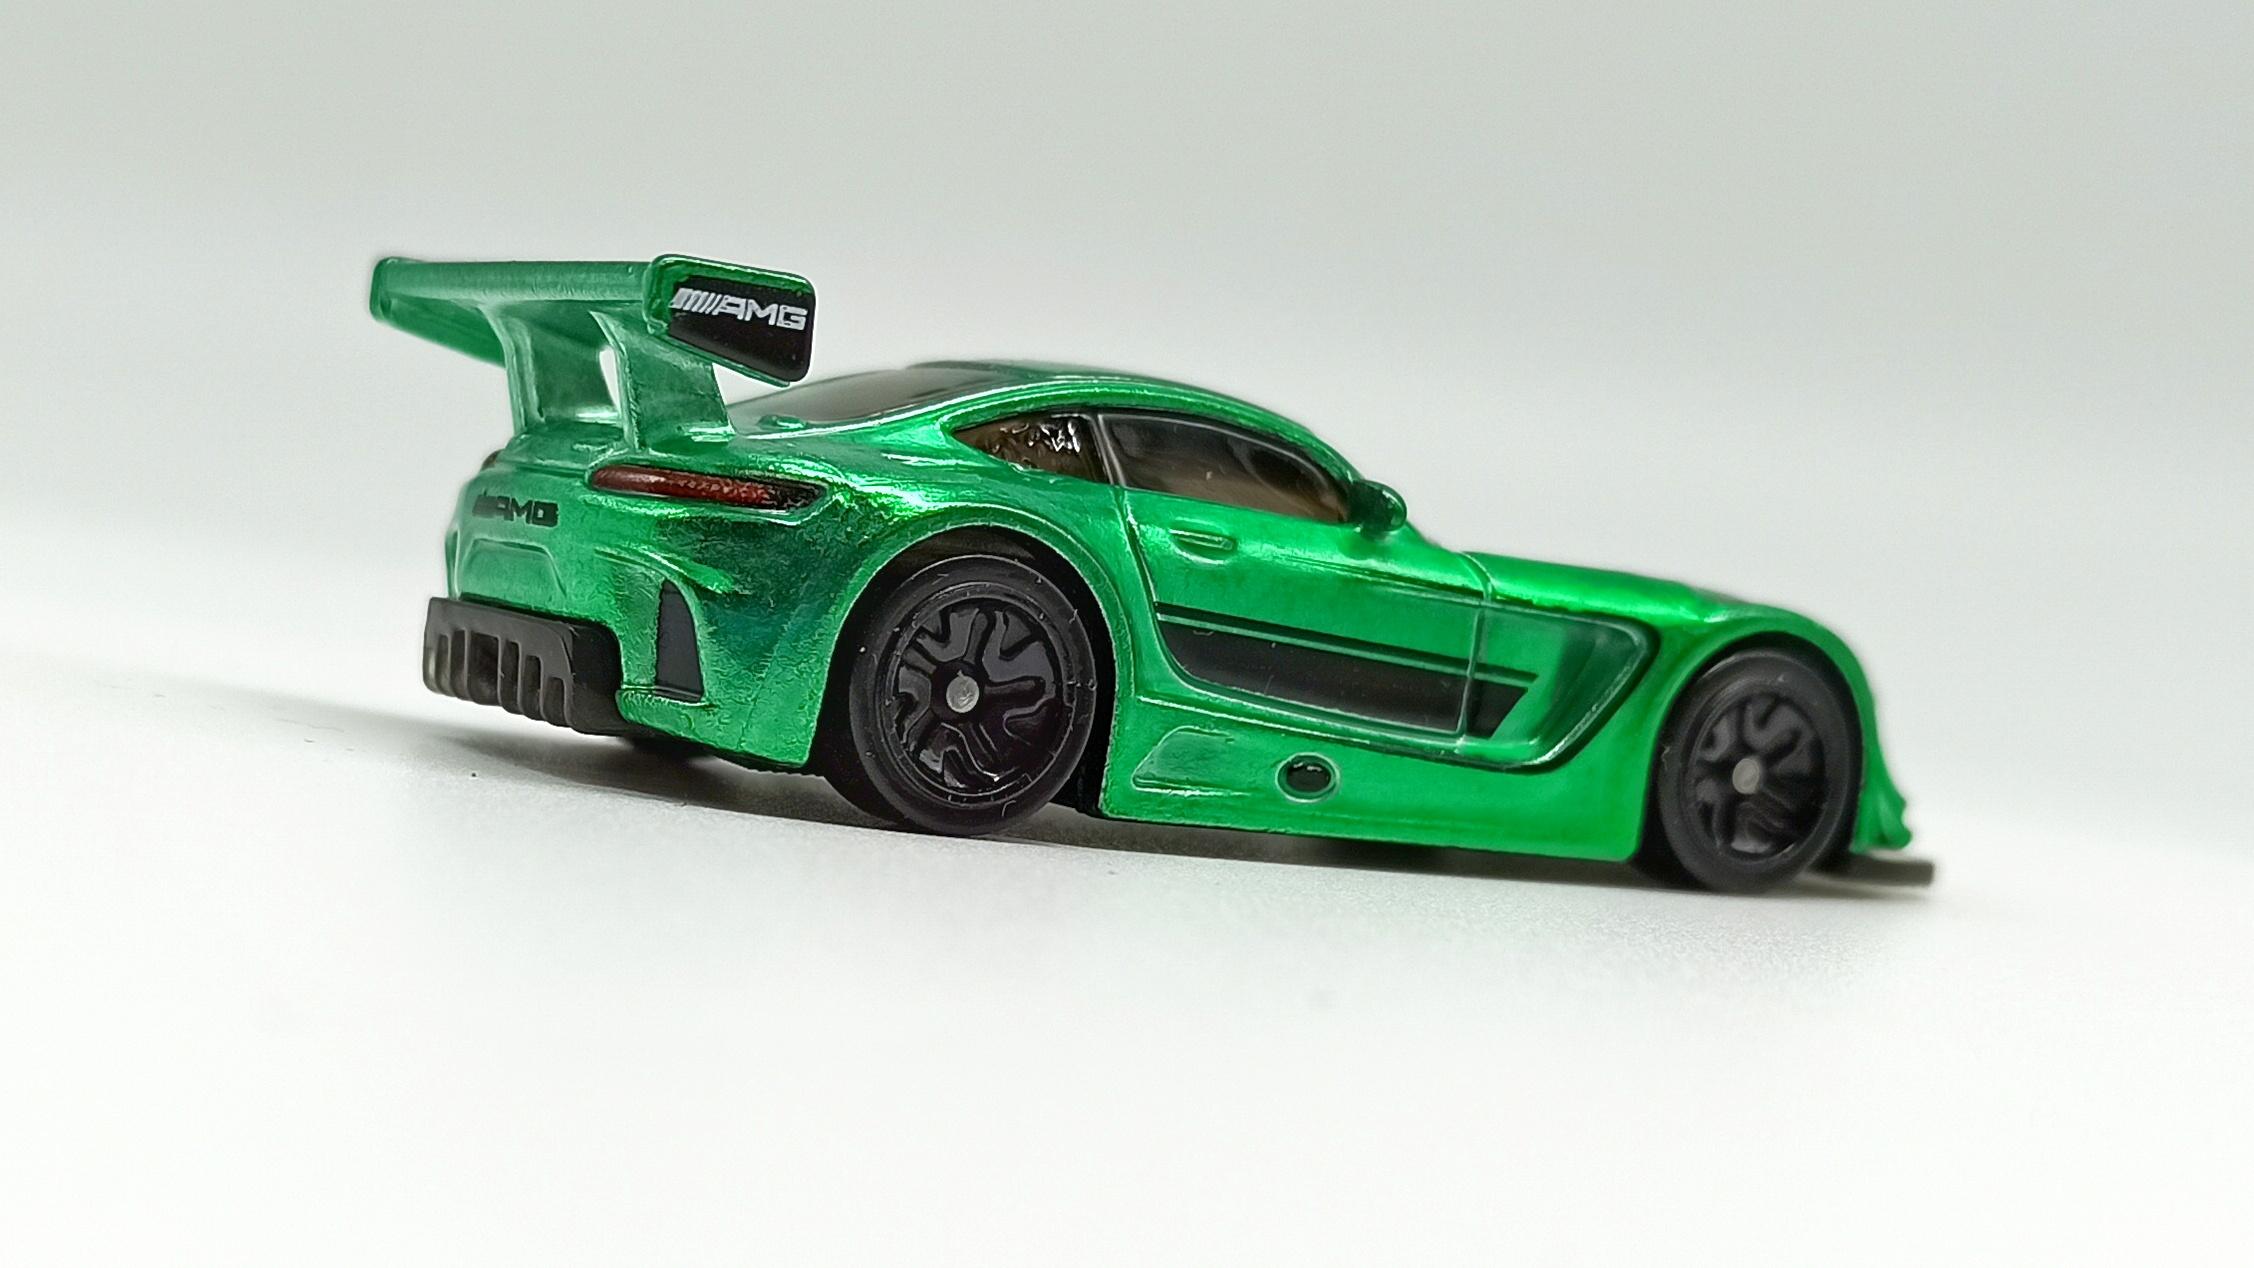 Hot Wheels id '16 Mercedes-AMG GT3 (GML21) 2021 Factory Fresh (03/04) spectraflame green side angle